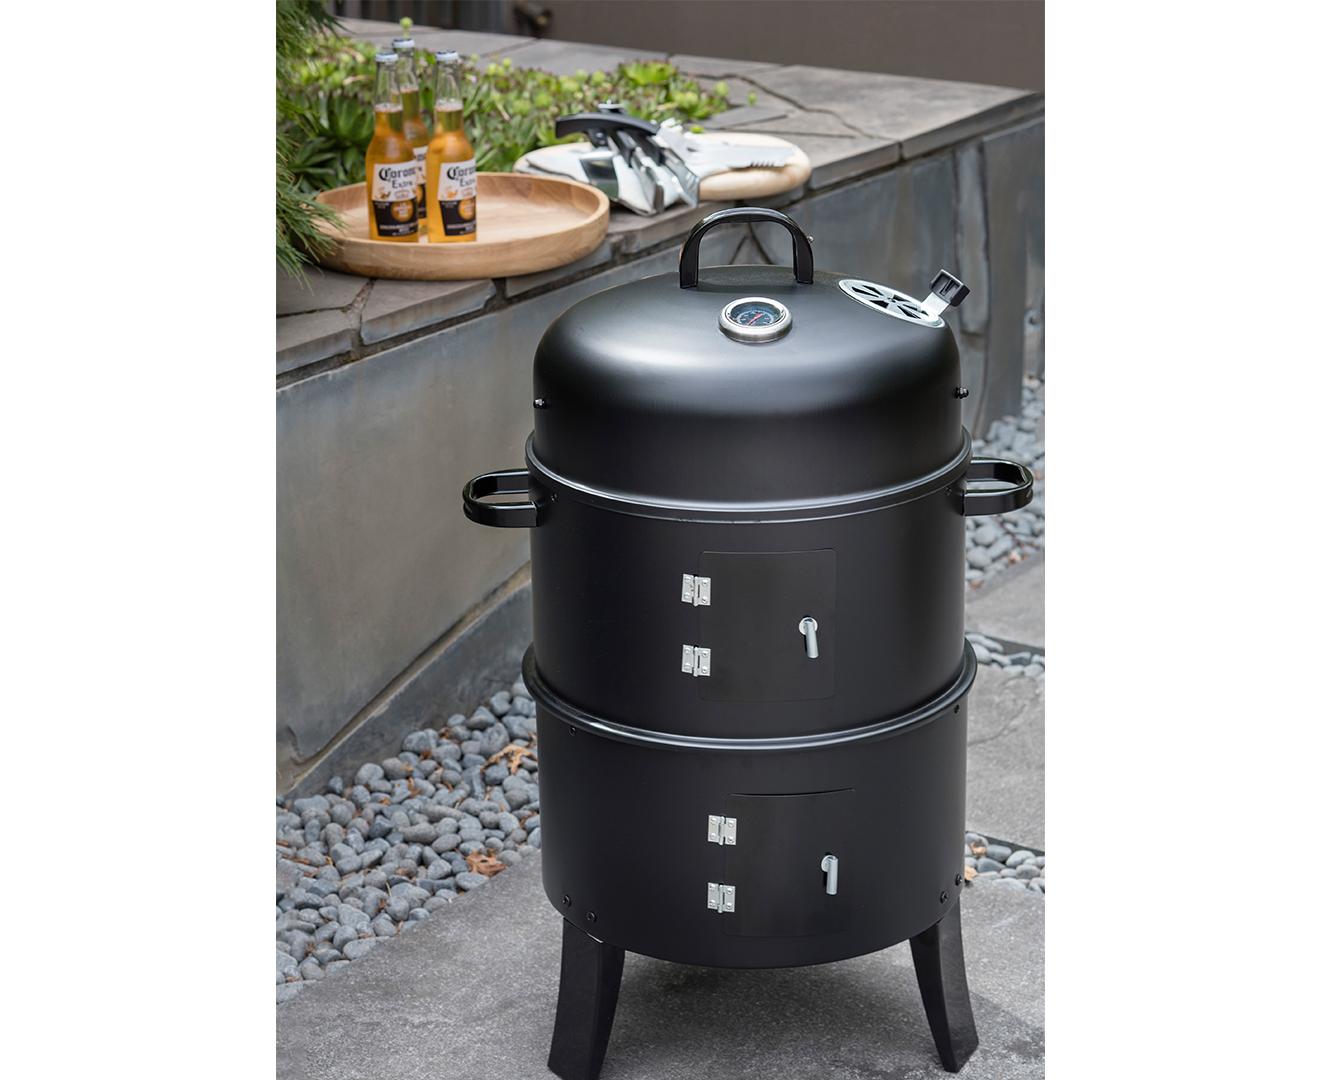 Charmate 3 In 1 Charcoal BBQ Smoker